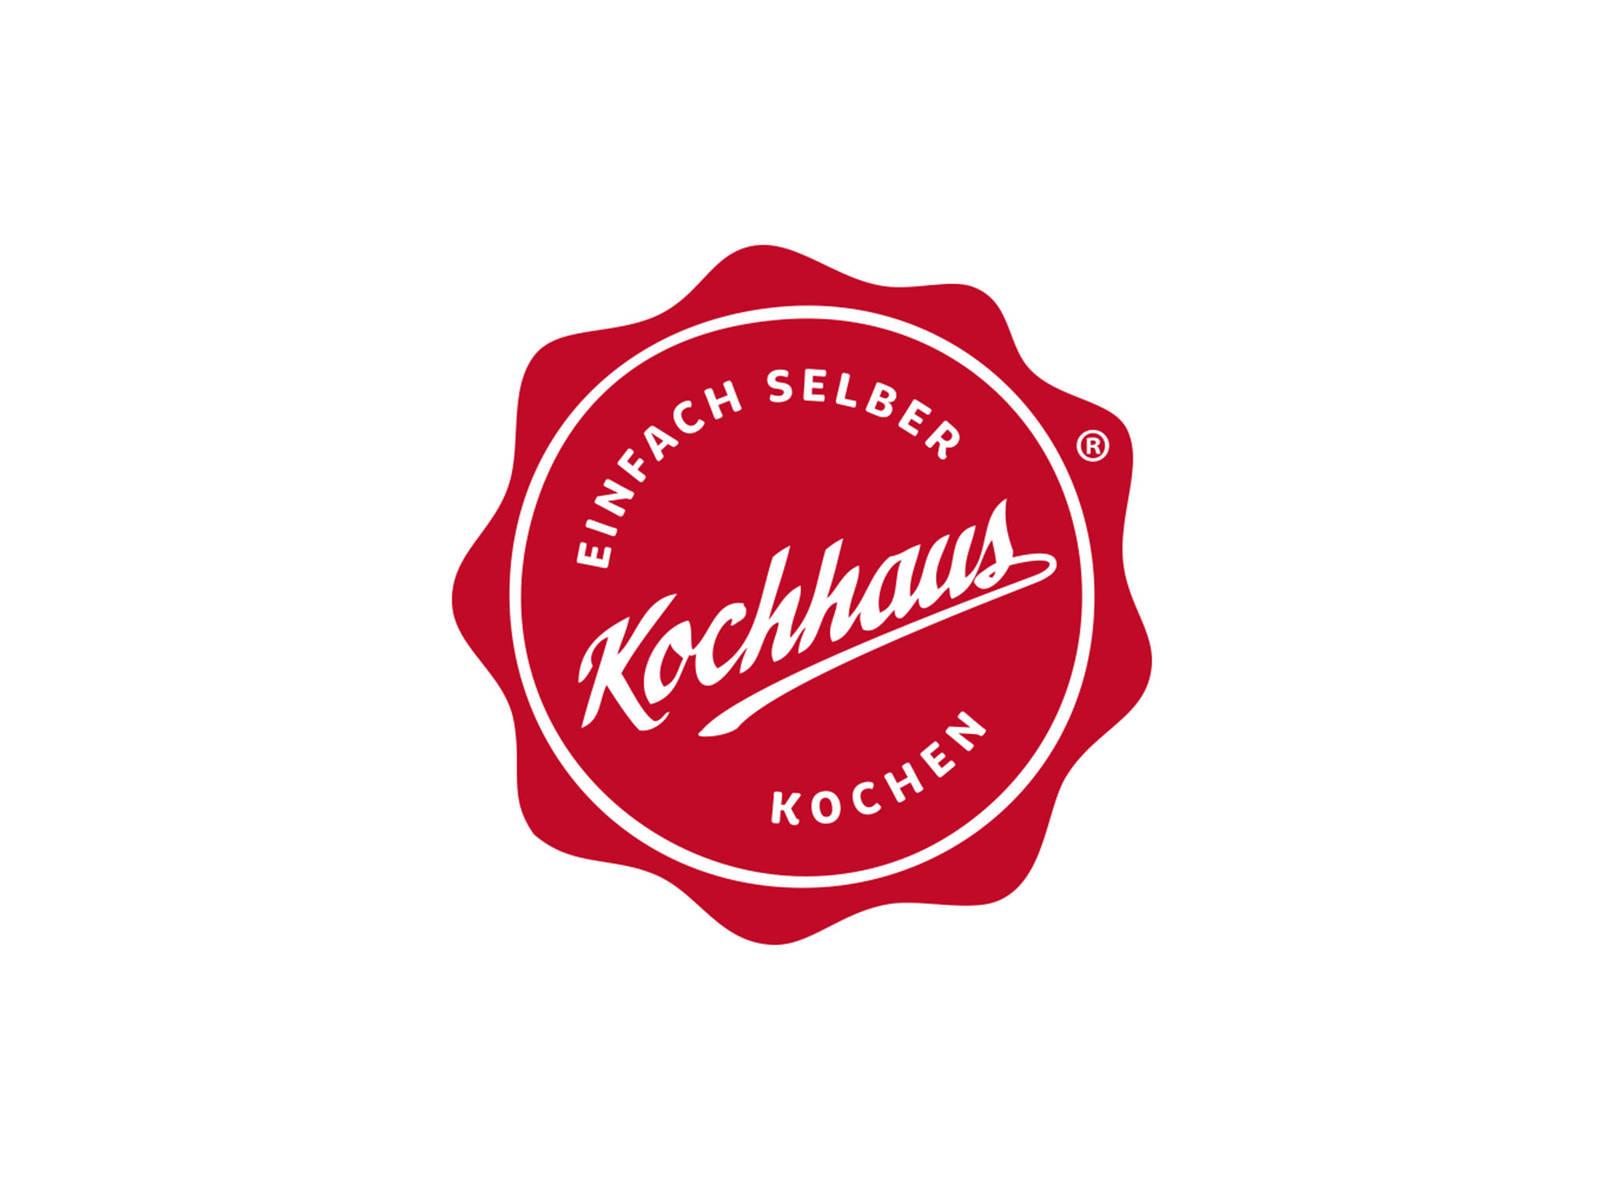 Kochhaus祝你好胃口!